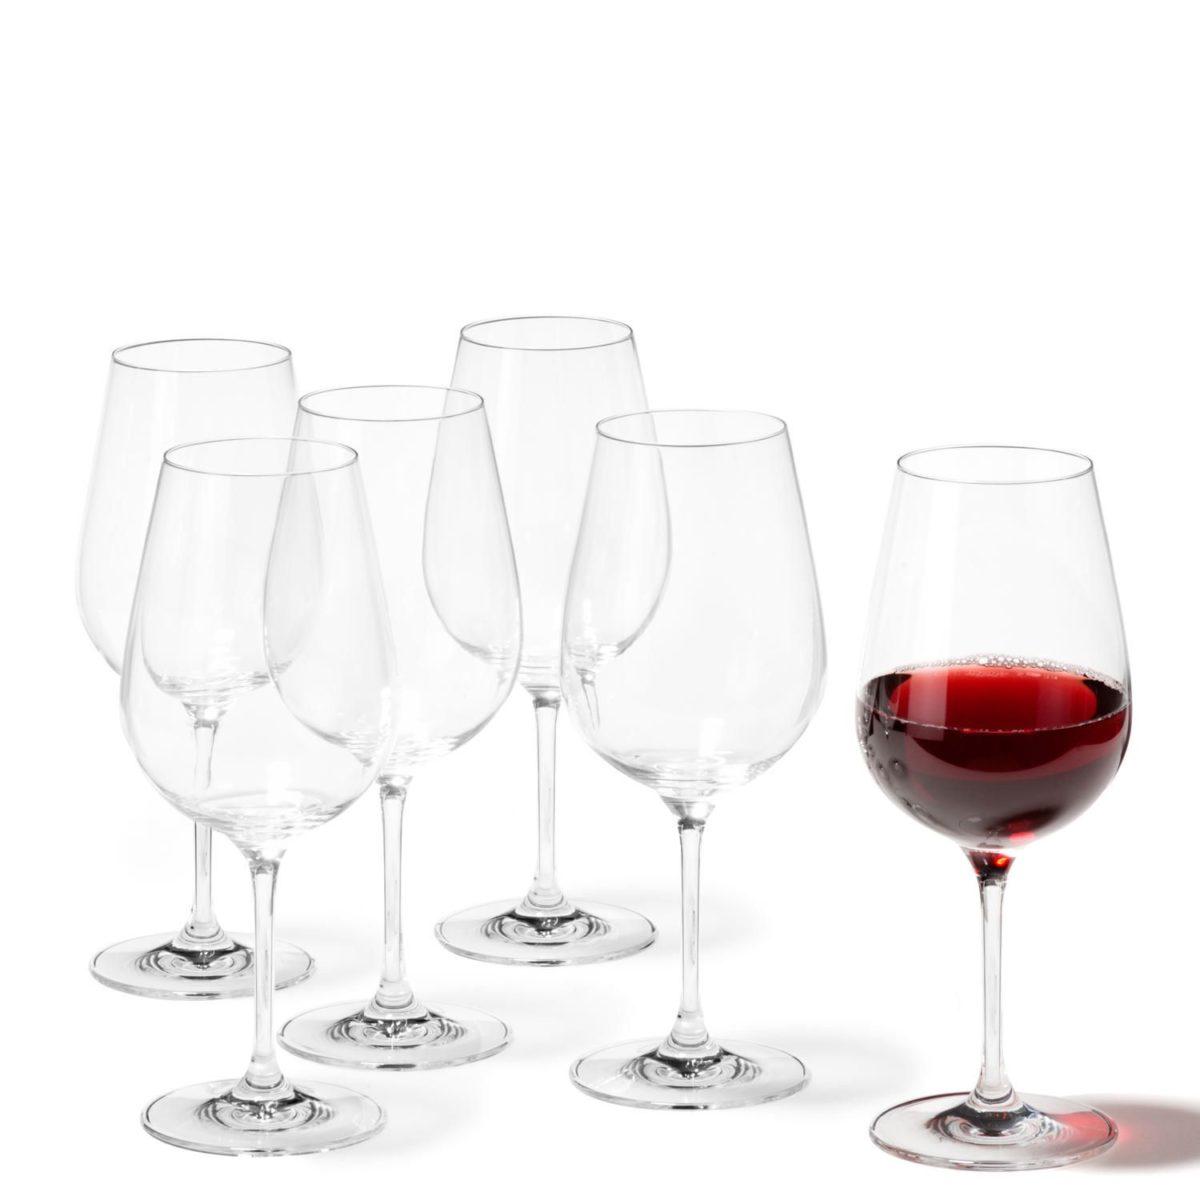 Leonardo Rotweinglas Tivoli 580ml H 002.xxl3  1200x1200 - Pahar pentru vin roșu Tivoli 580 ml (L020964)